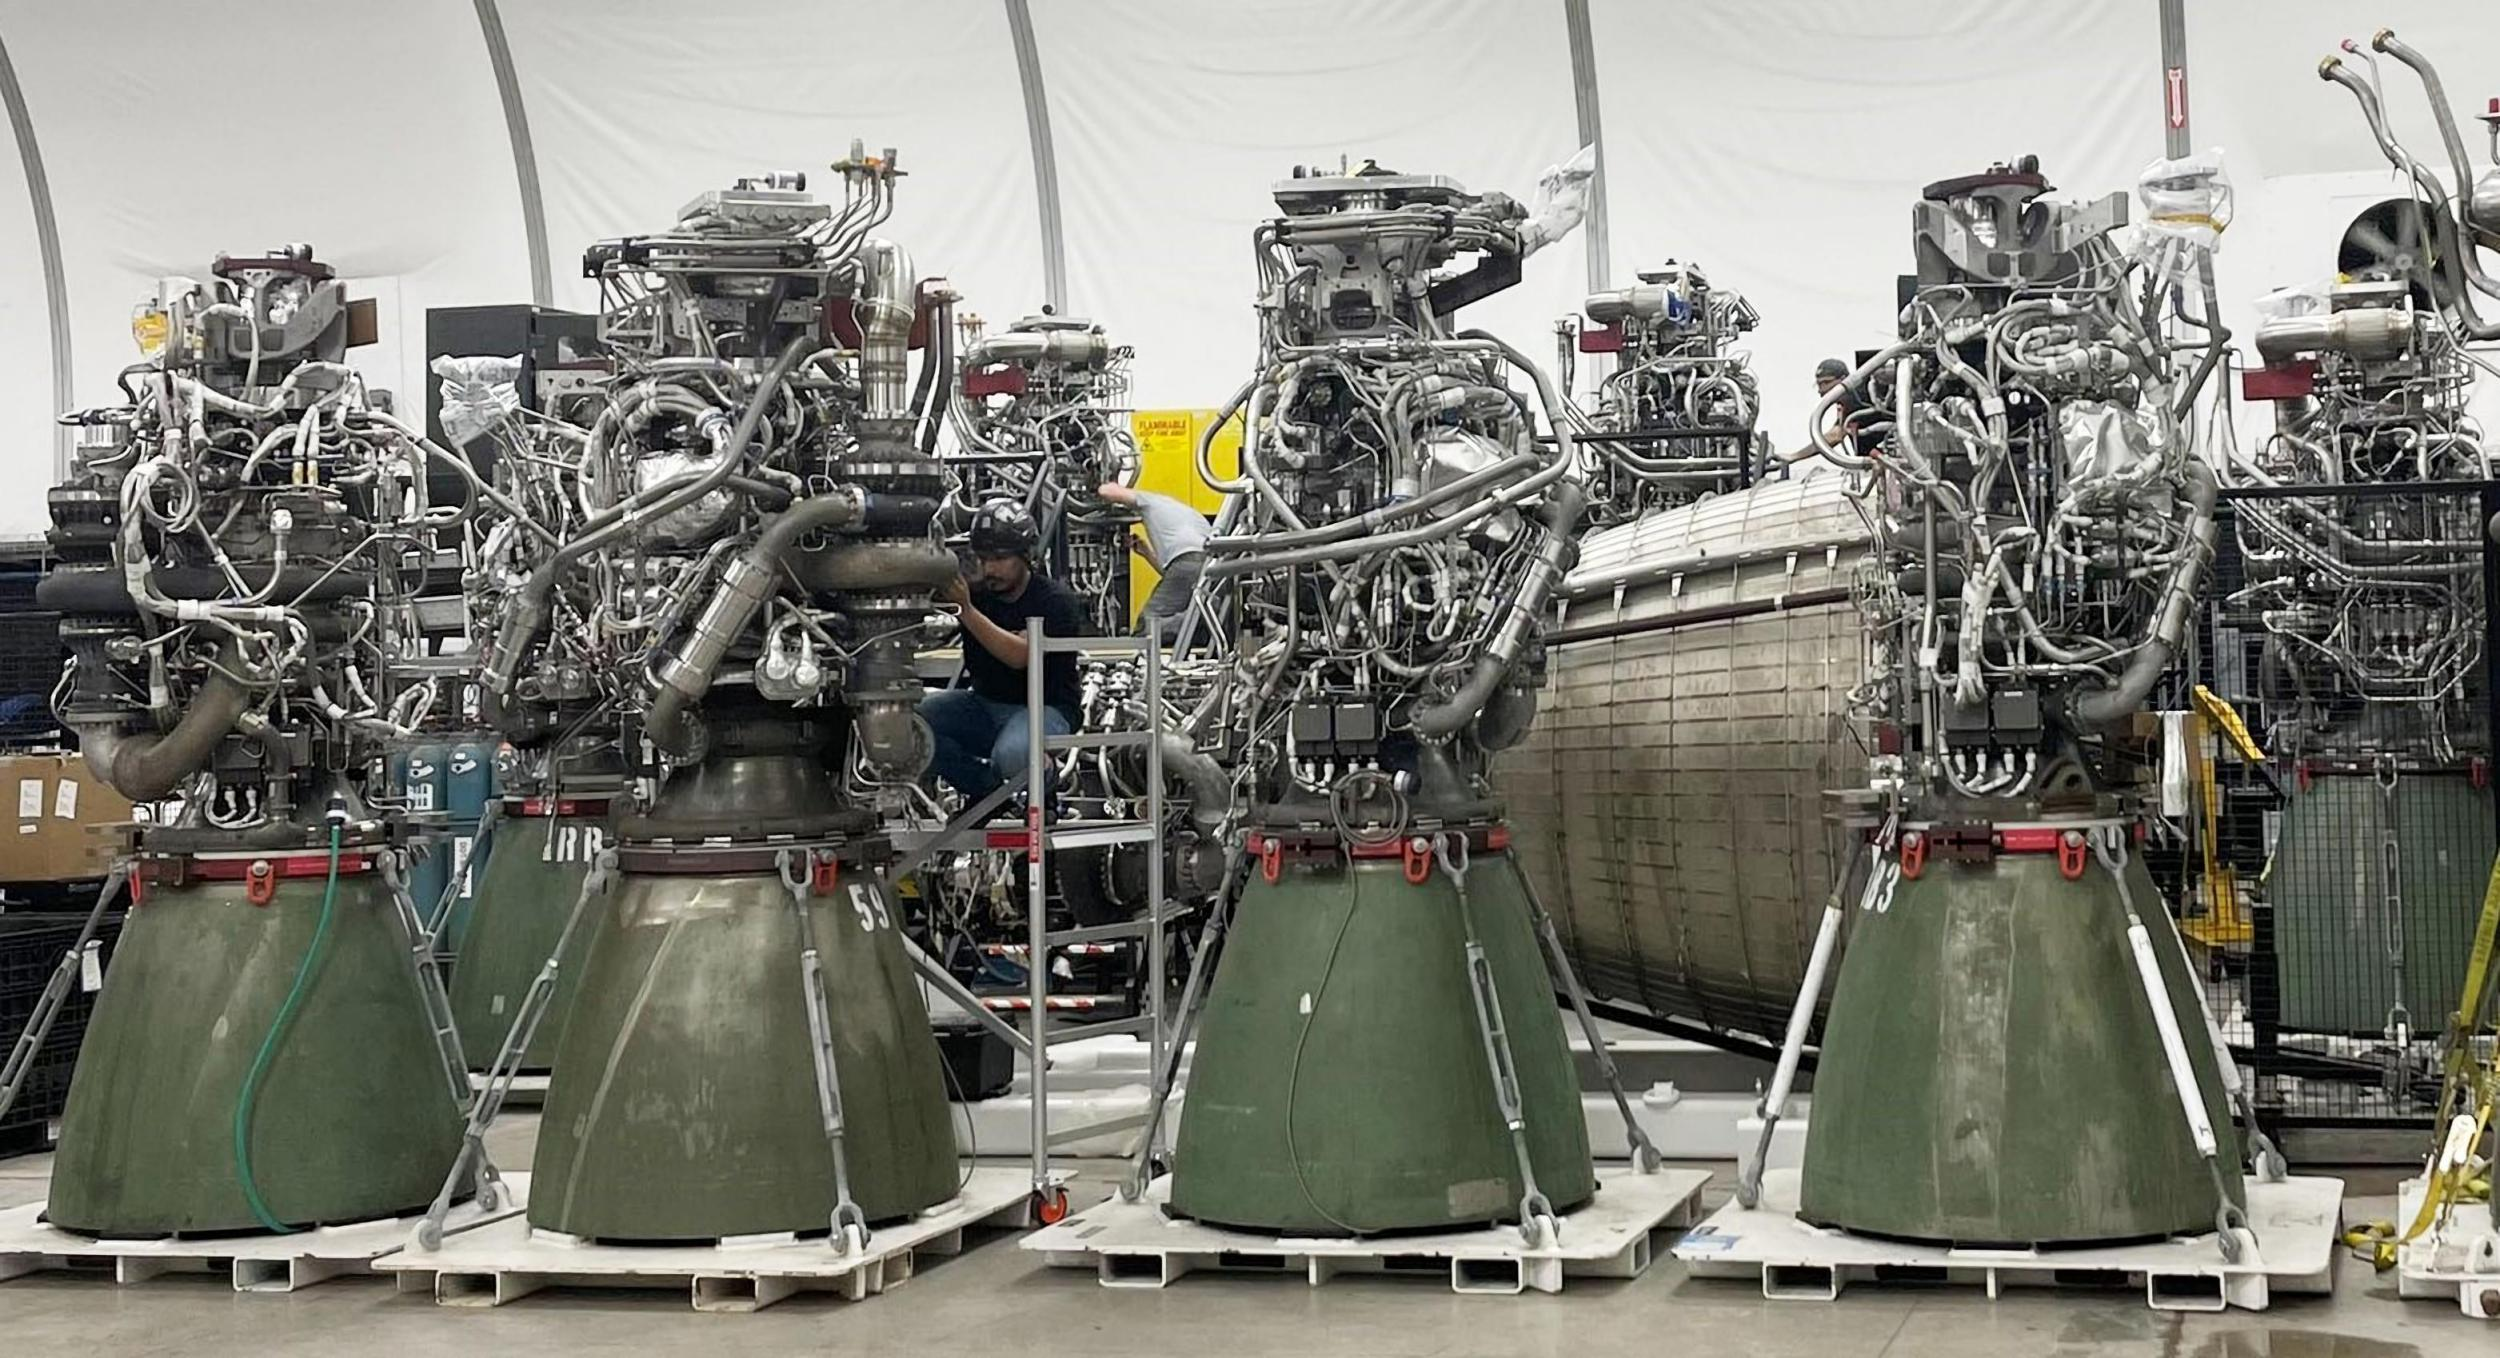 Starship Boca Chica Raptor engines (Elon Musk) 1 crop 2X (c)